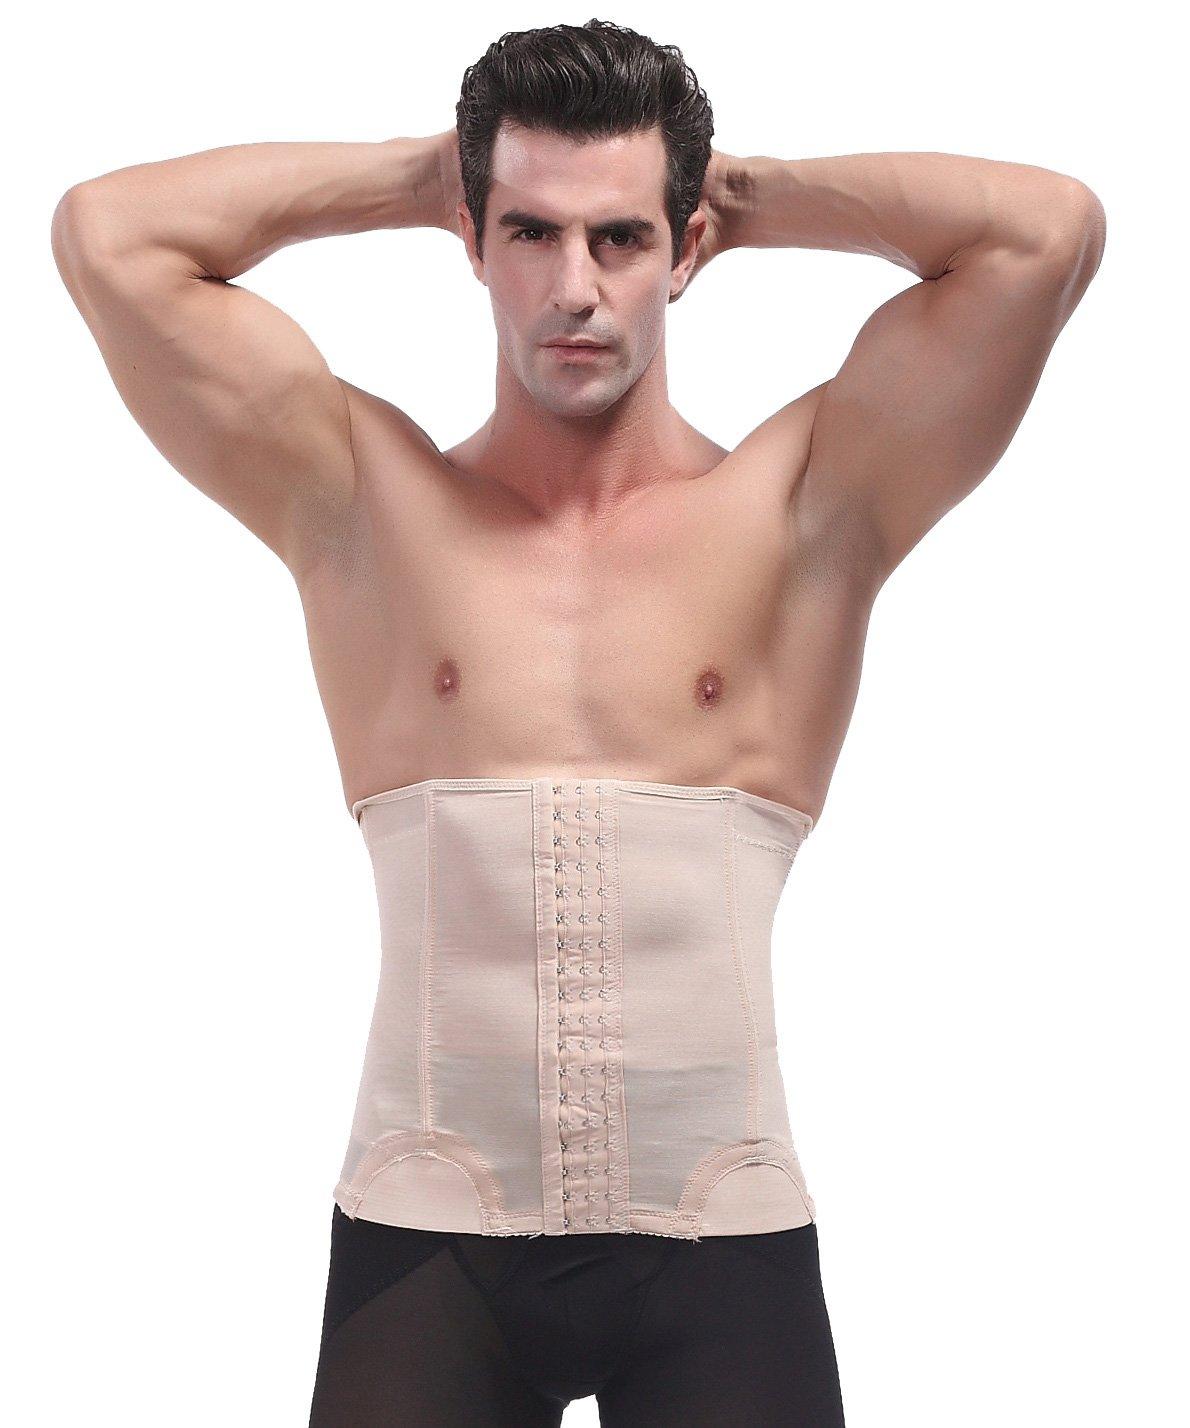 Panegy Memory Alloy Boning Waist Trimmer Girdle Compression Slimmer Belt Shapewear for Men Size XL White